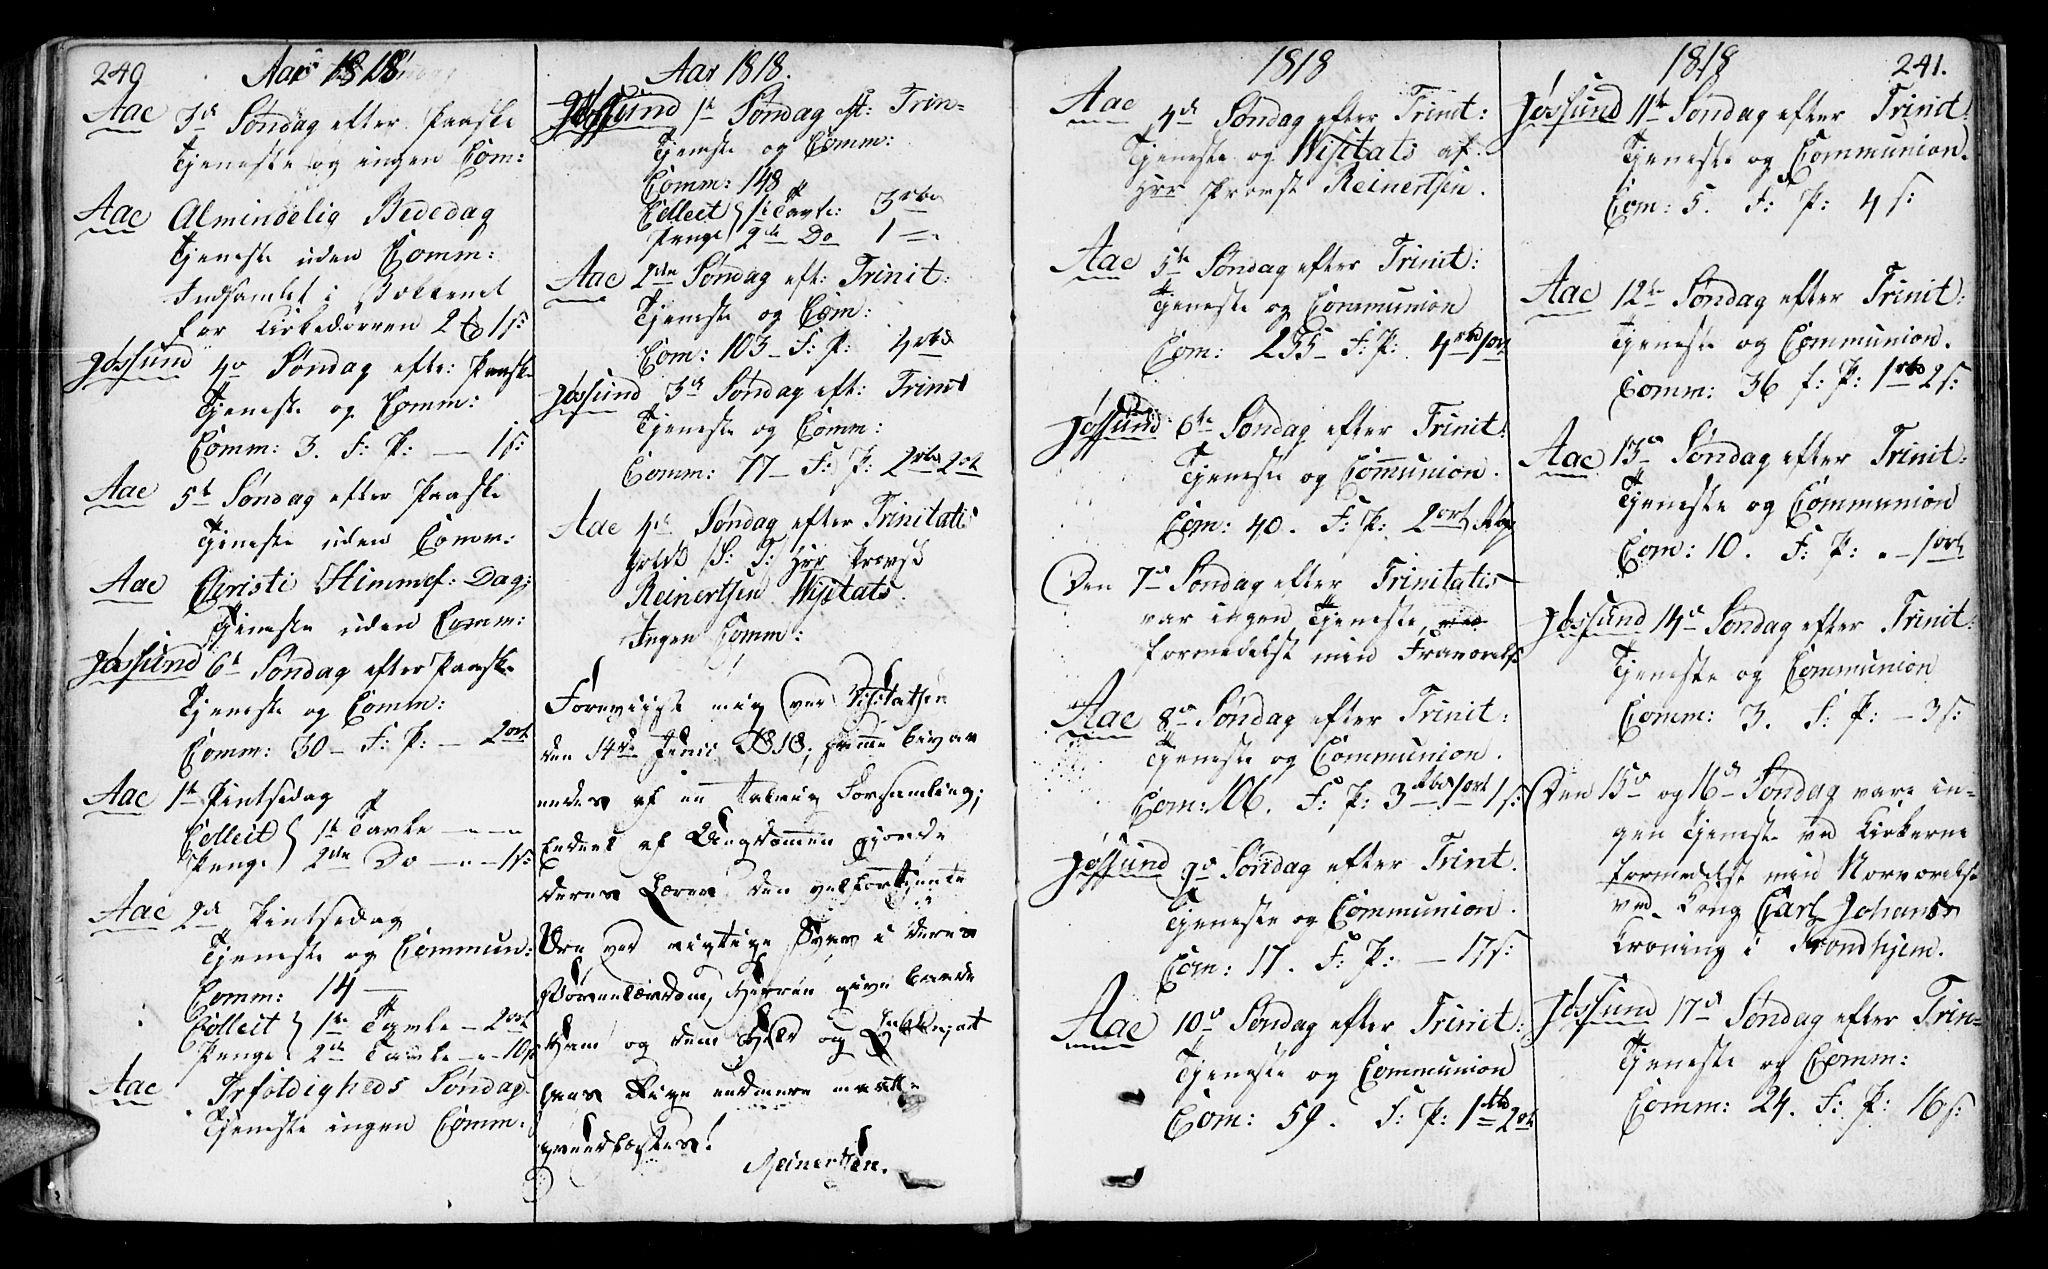 SAT, Ministerialprotokoller, klokkerbøker og fødselsregistre - Sør-Trøndelag, 655/L0674: Parish register (official) no. 655A03, 1802-1826, p. 240-241